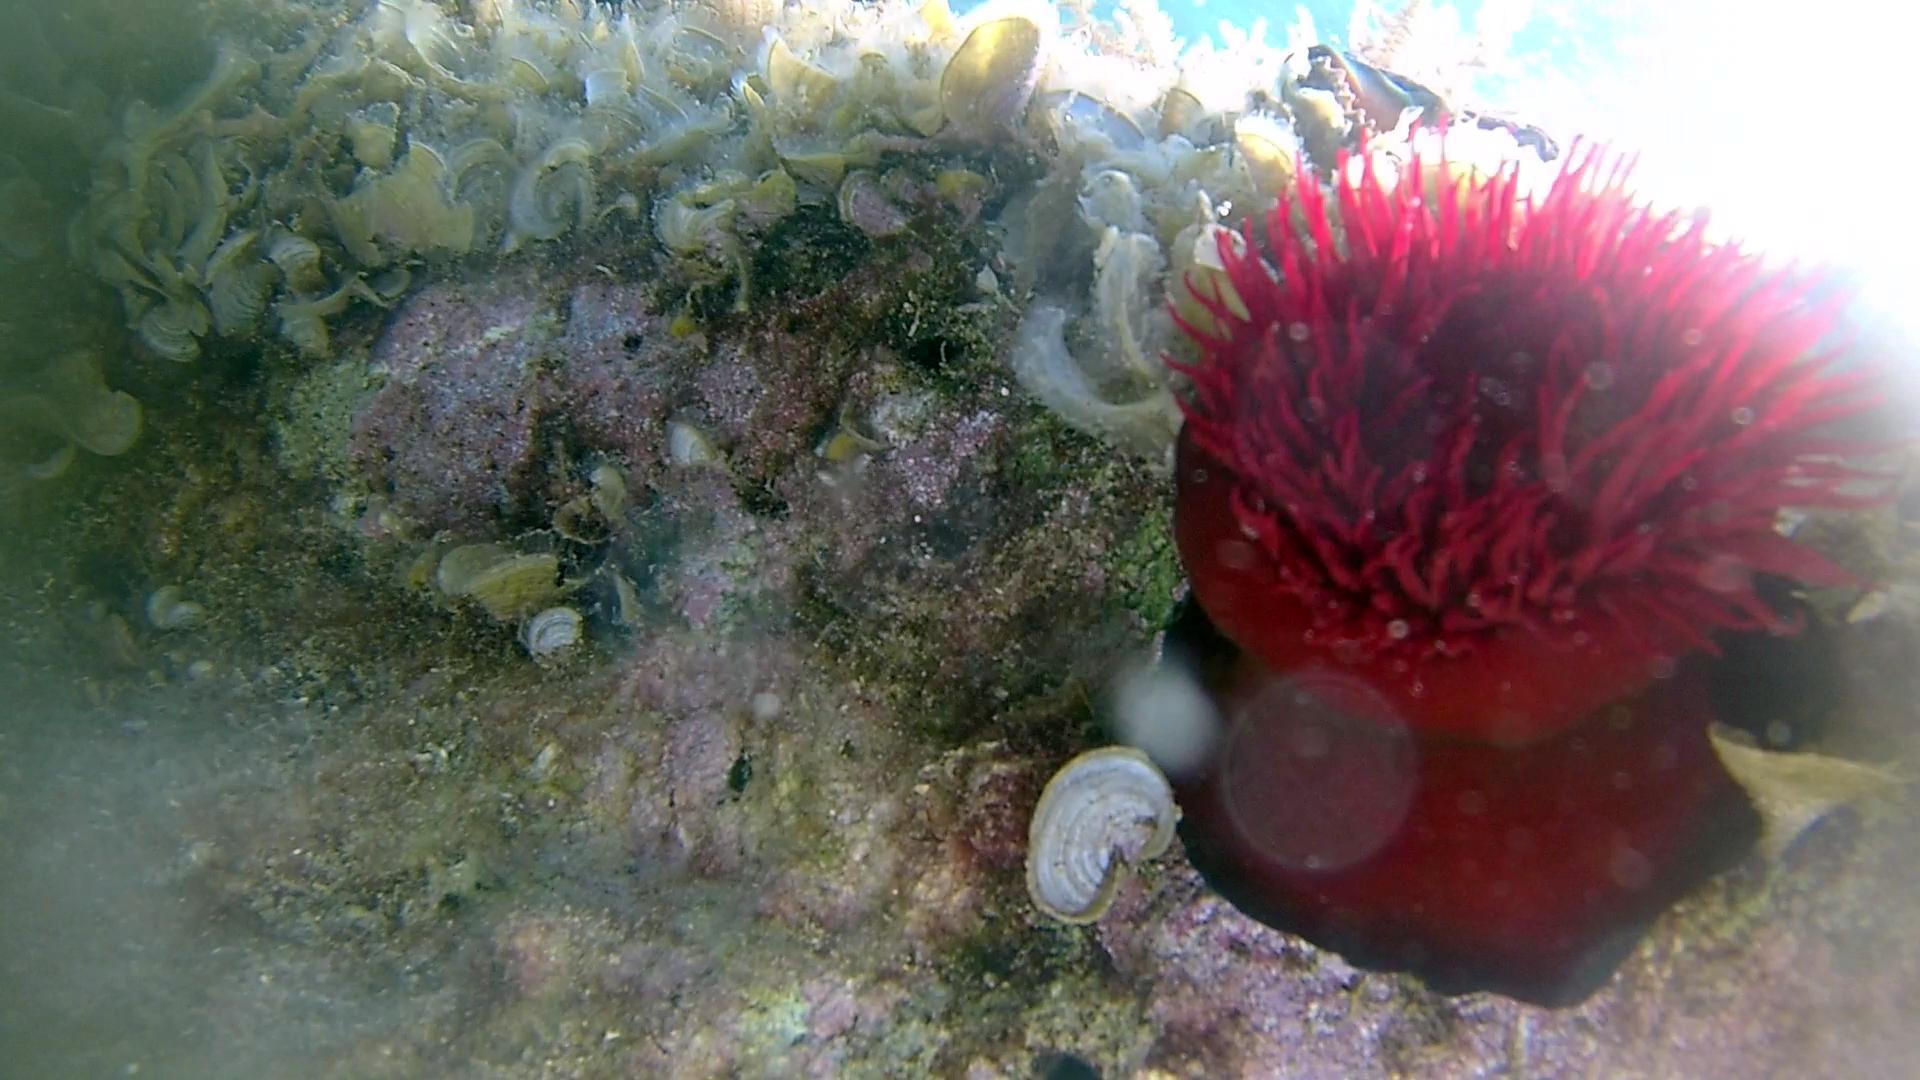 Actinia equina - Pomodoro di mare - Beadlet anemone - intotheblue.it